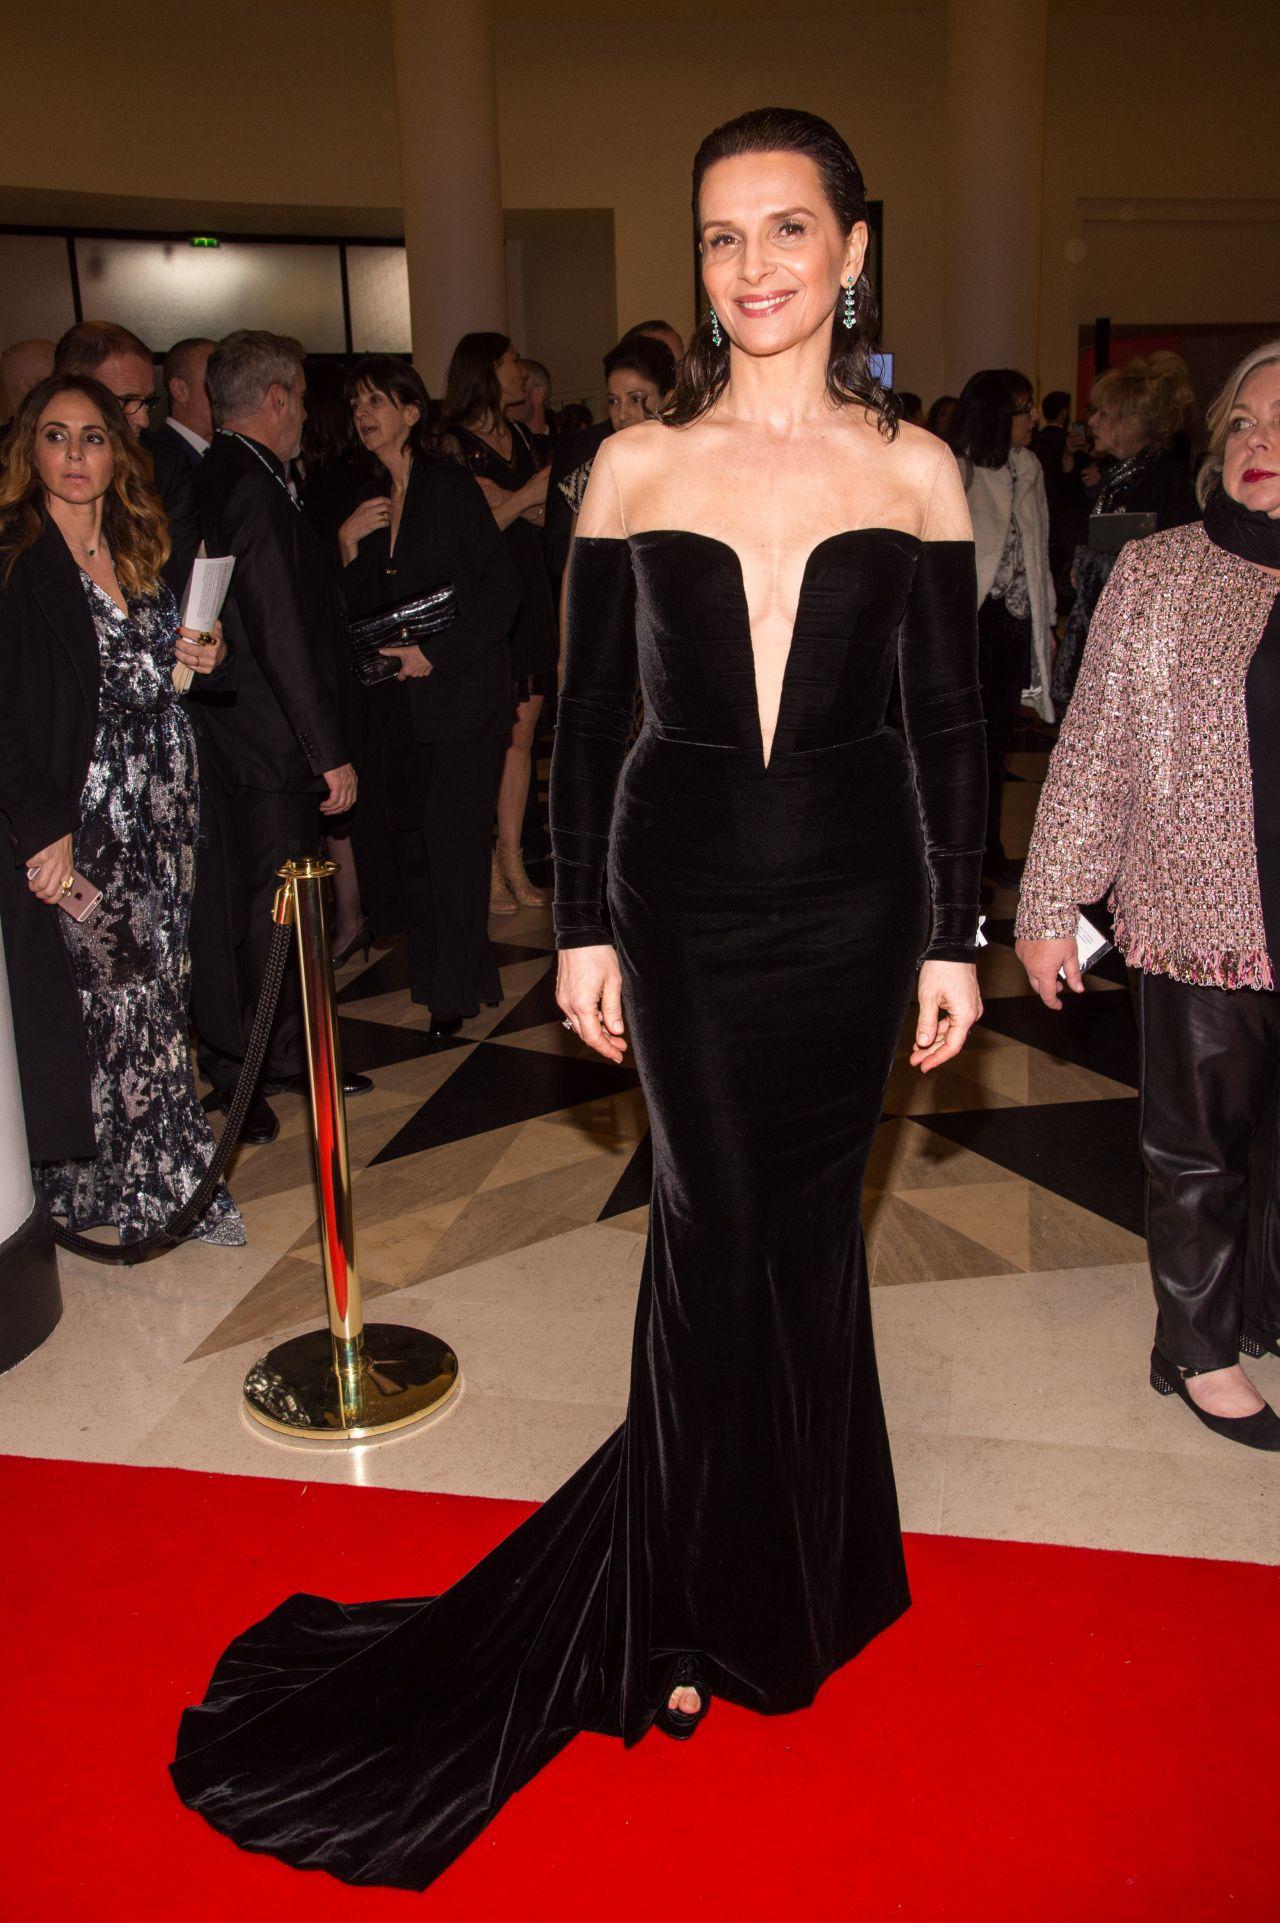 http://celebmafia.com/wp-content/uploads/2018/03/juliette-binoche-cesar-film-awards-2018-in-paris-6.jpg